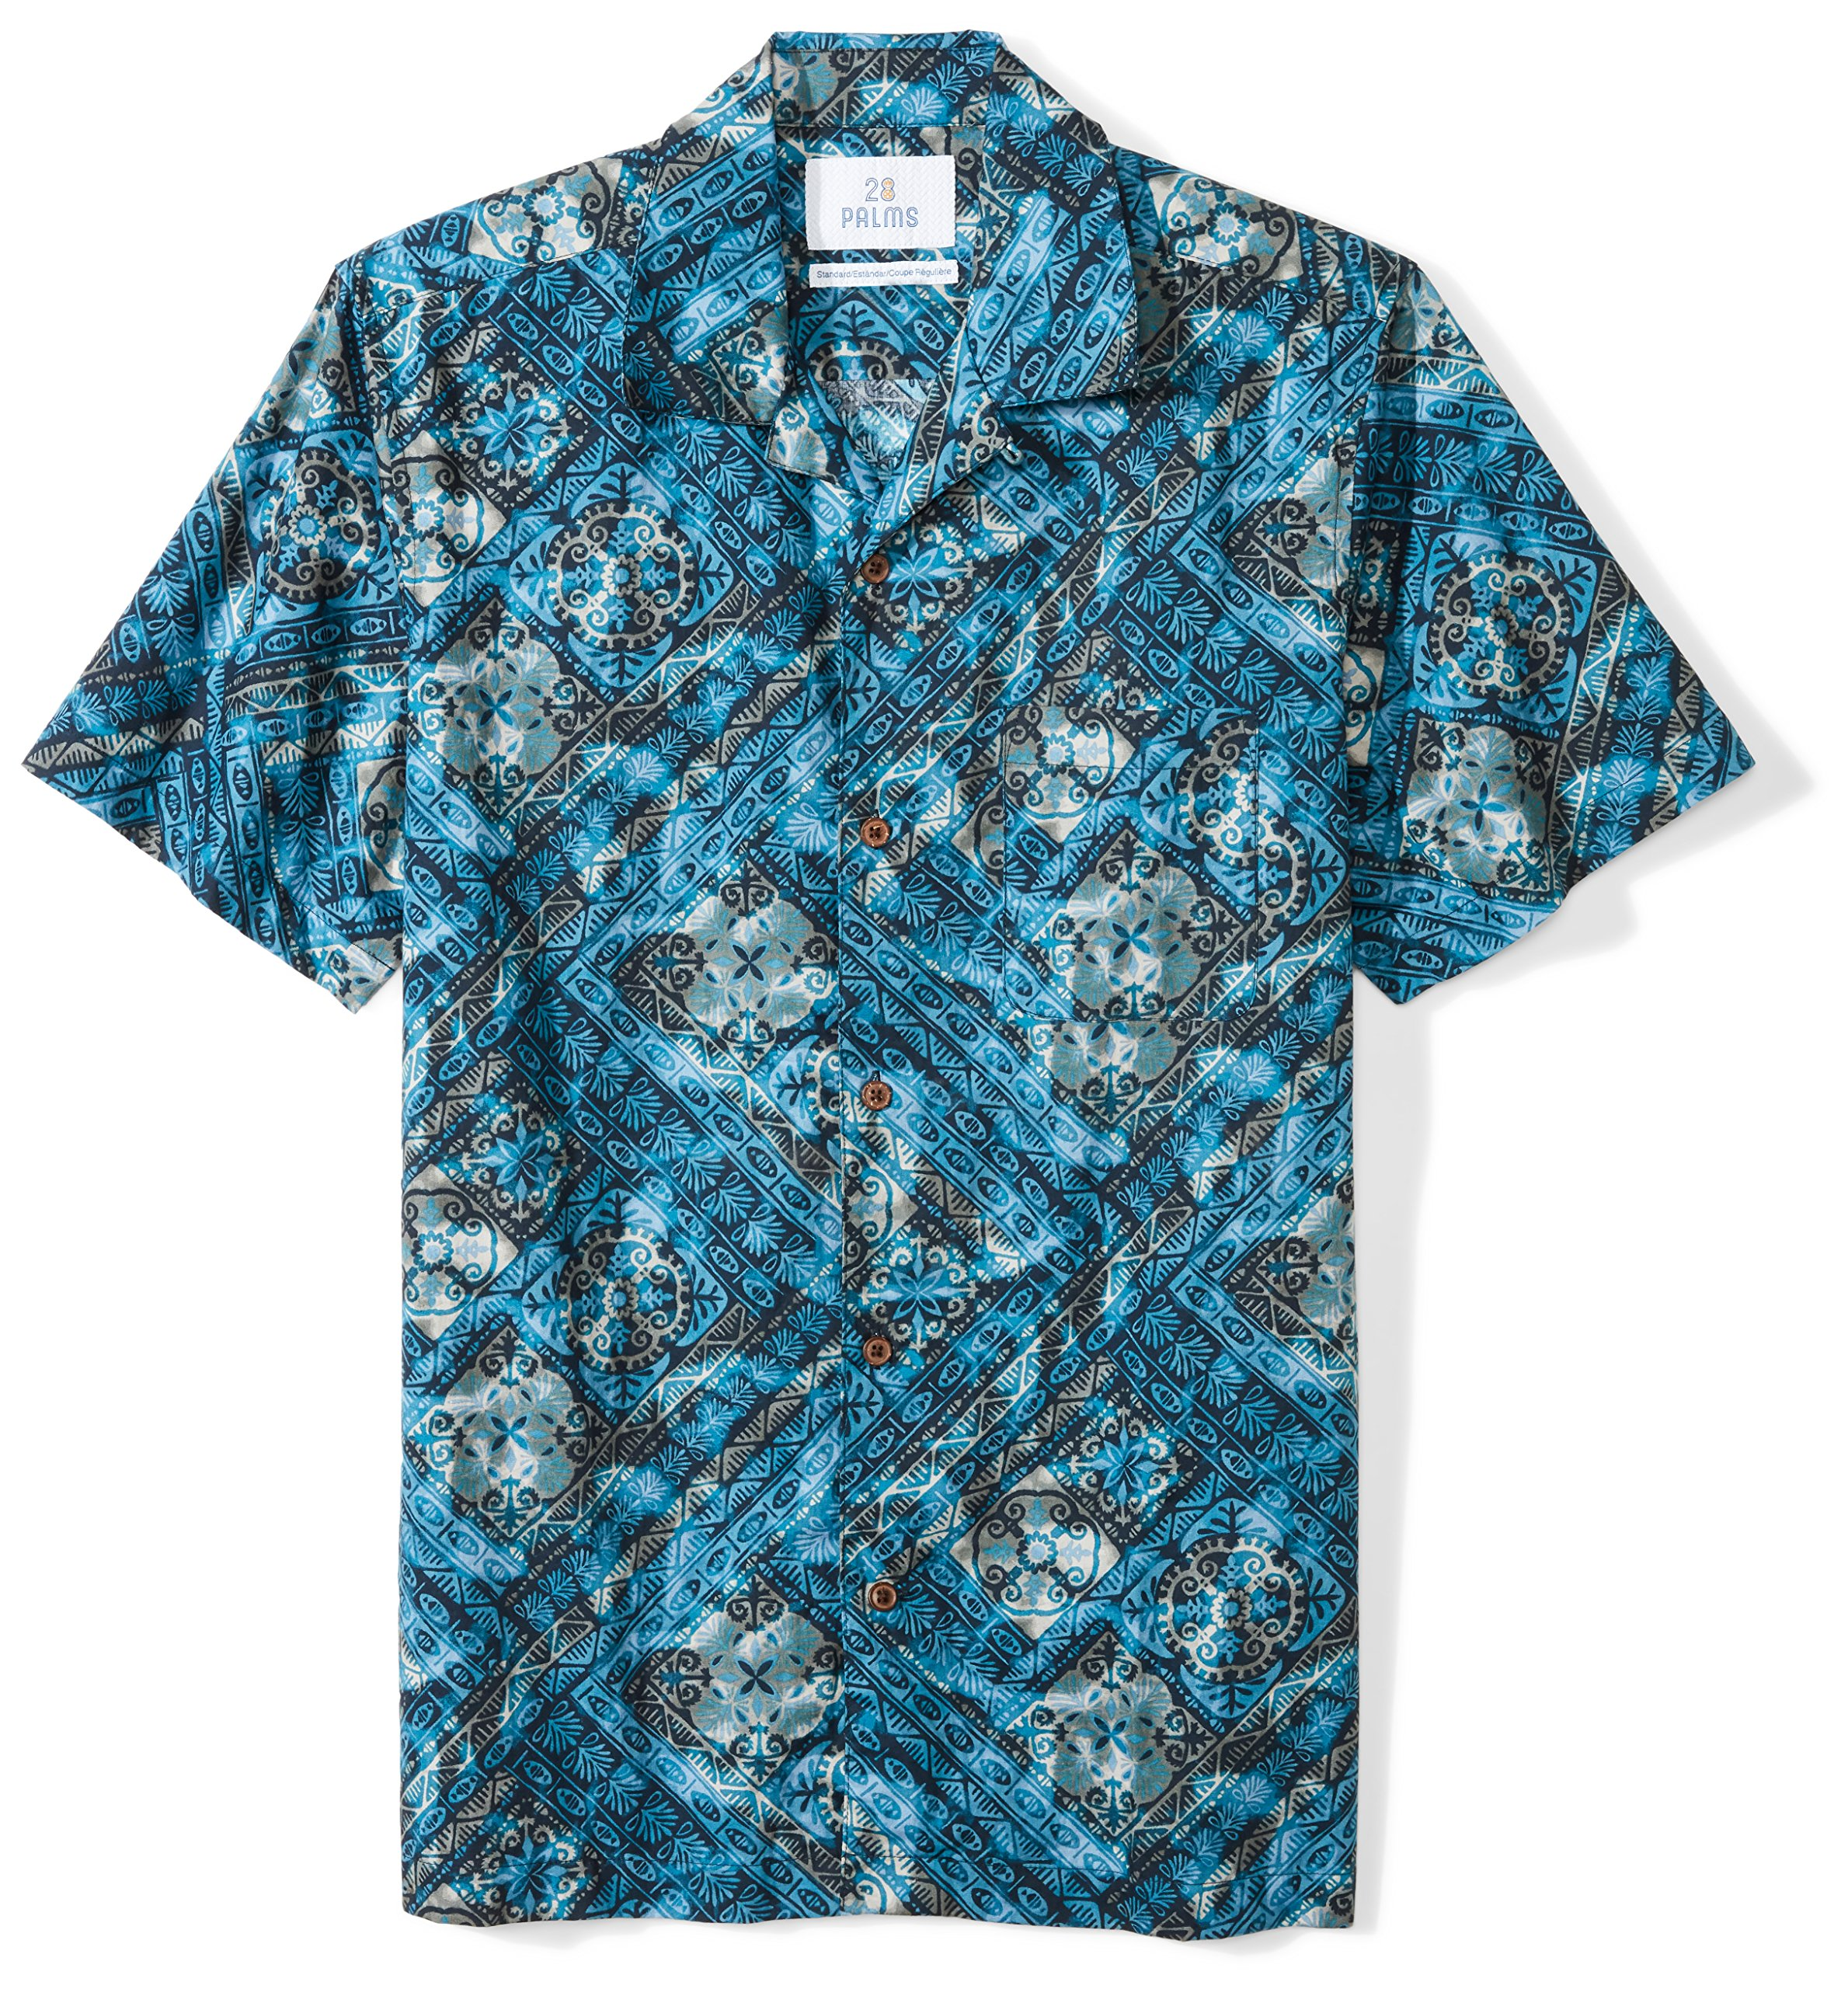 a105a5ee Galleon - 28 Palms Men's Standard-Fit 100% Cotton Tropical Hawaiian Batik  Shirt, Tile Blue, Small